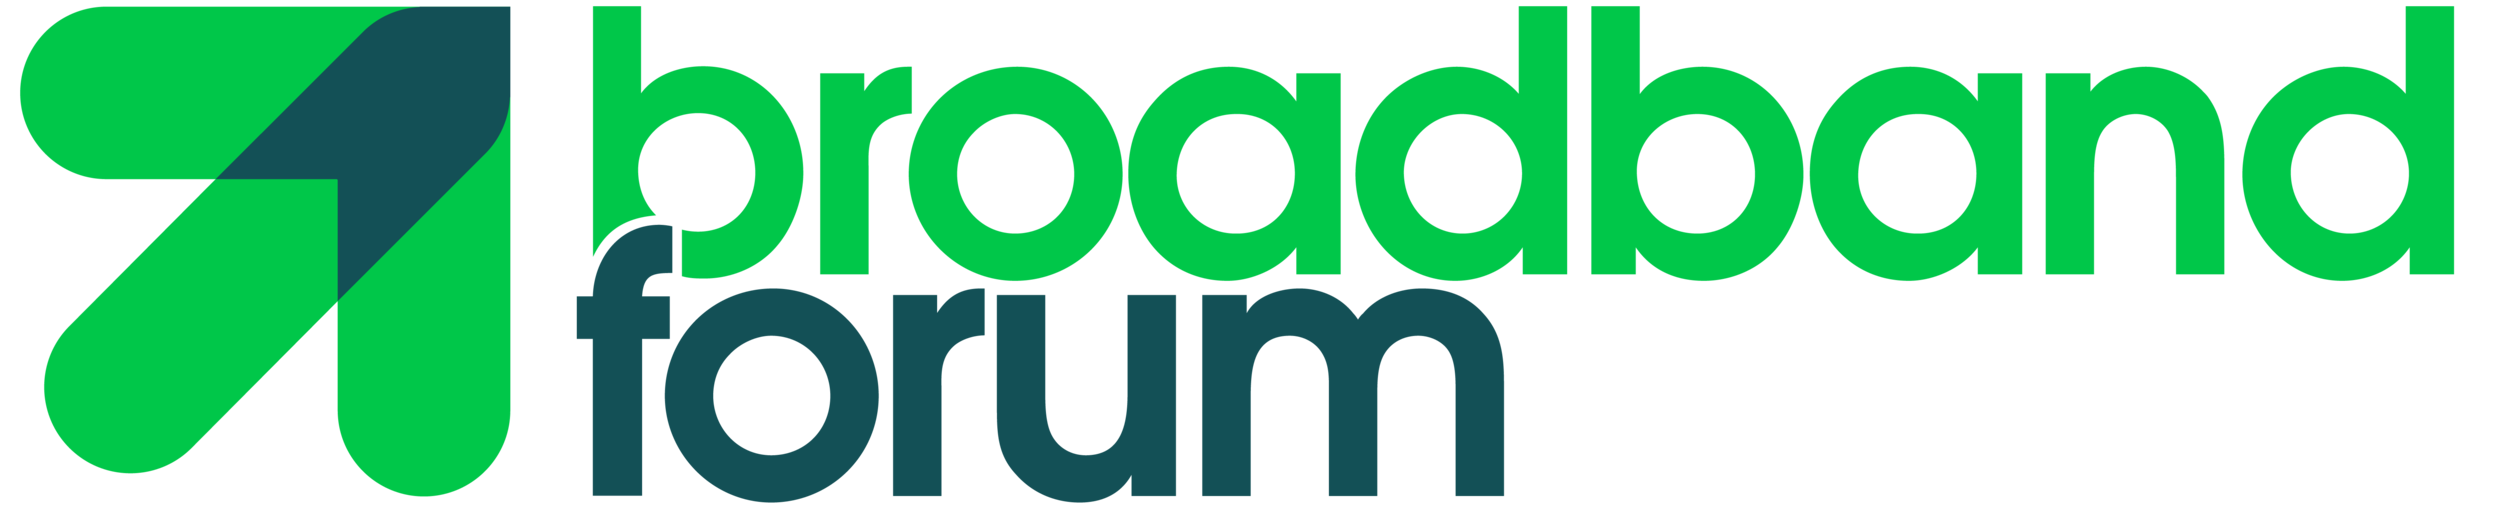 Broadband-Forum-Logo-Final_BBF Color Logo.png